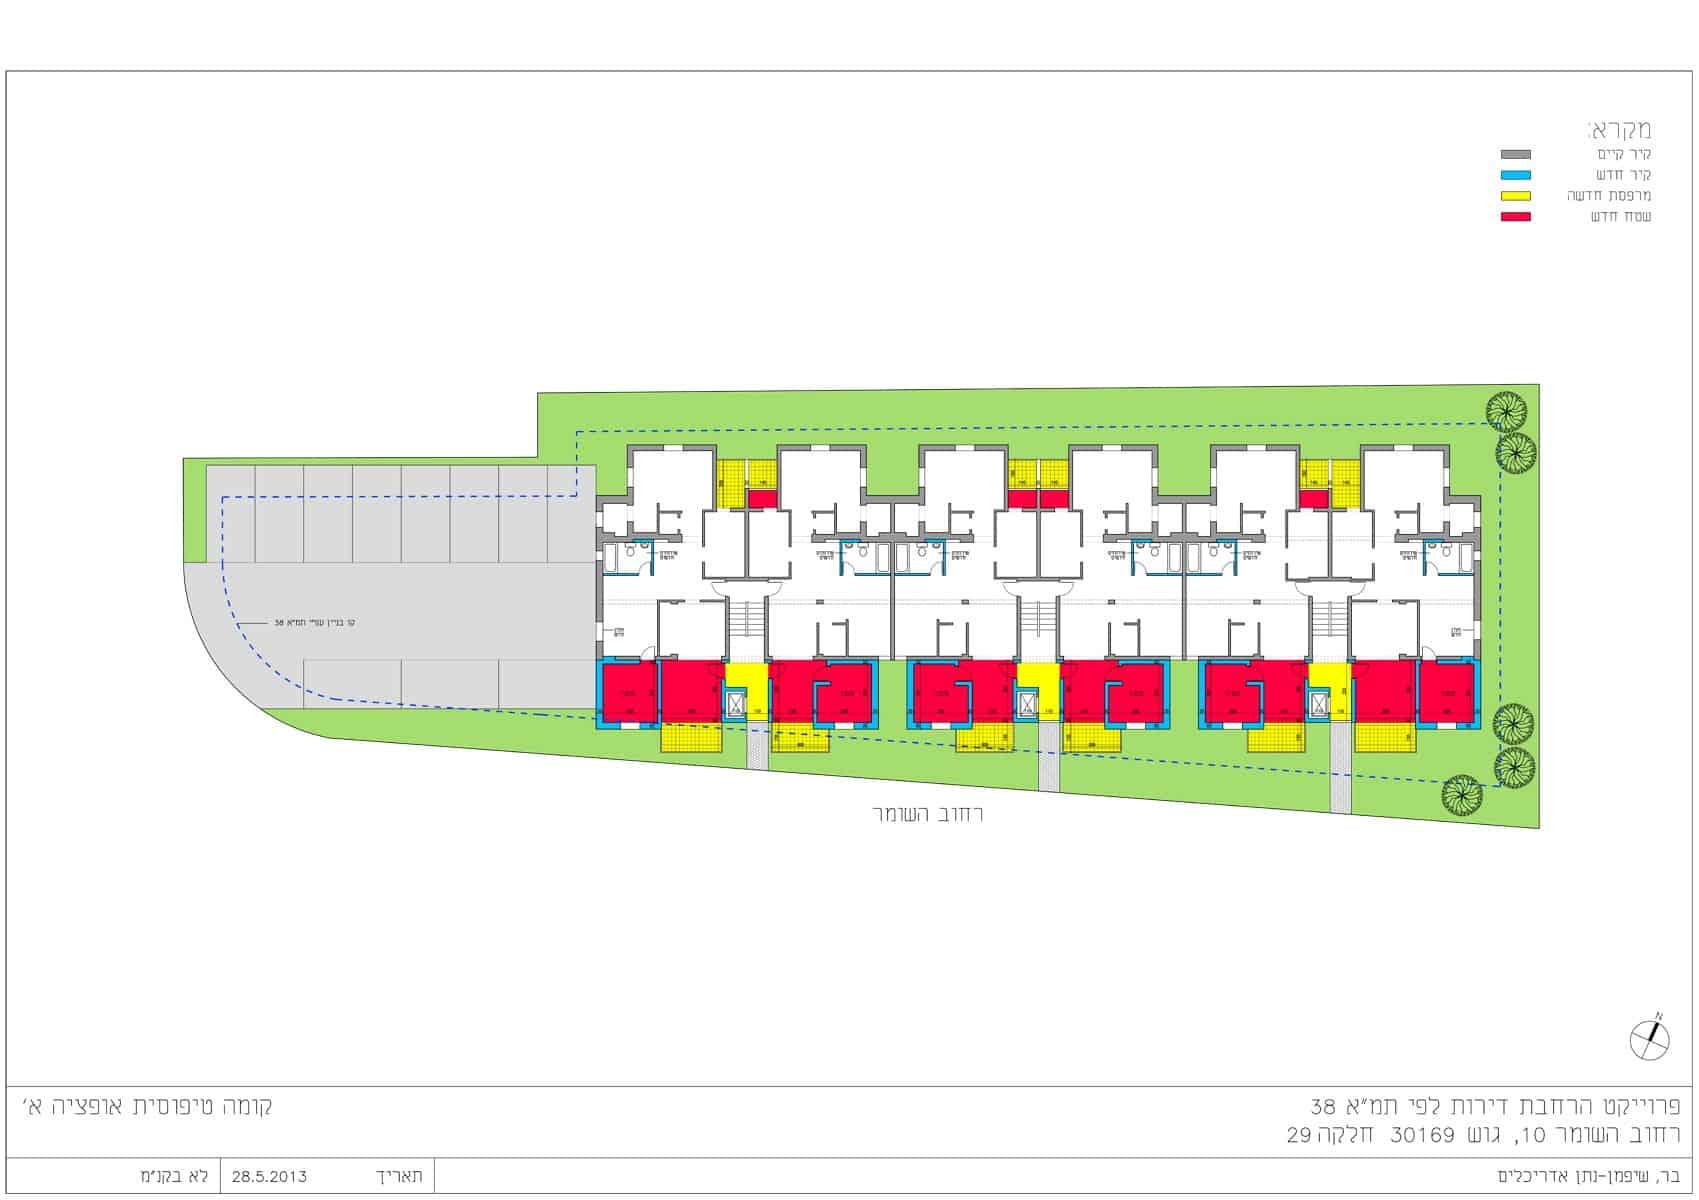 HaShomer 10, Jerusalem – Typical floor plan in Tama 38 project